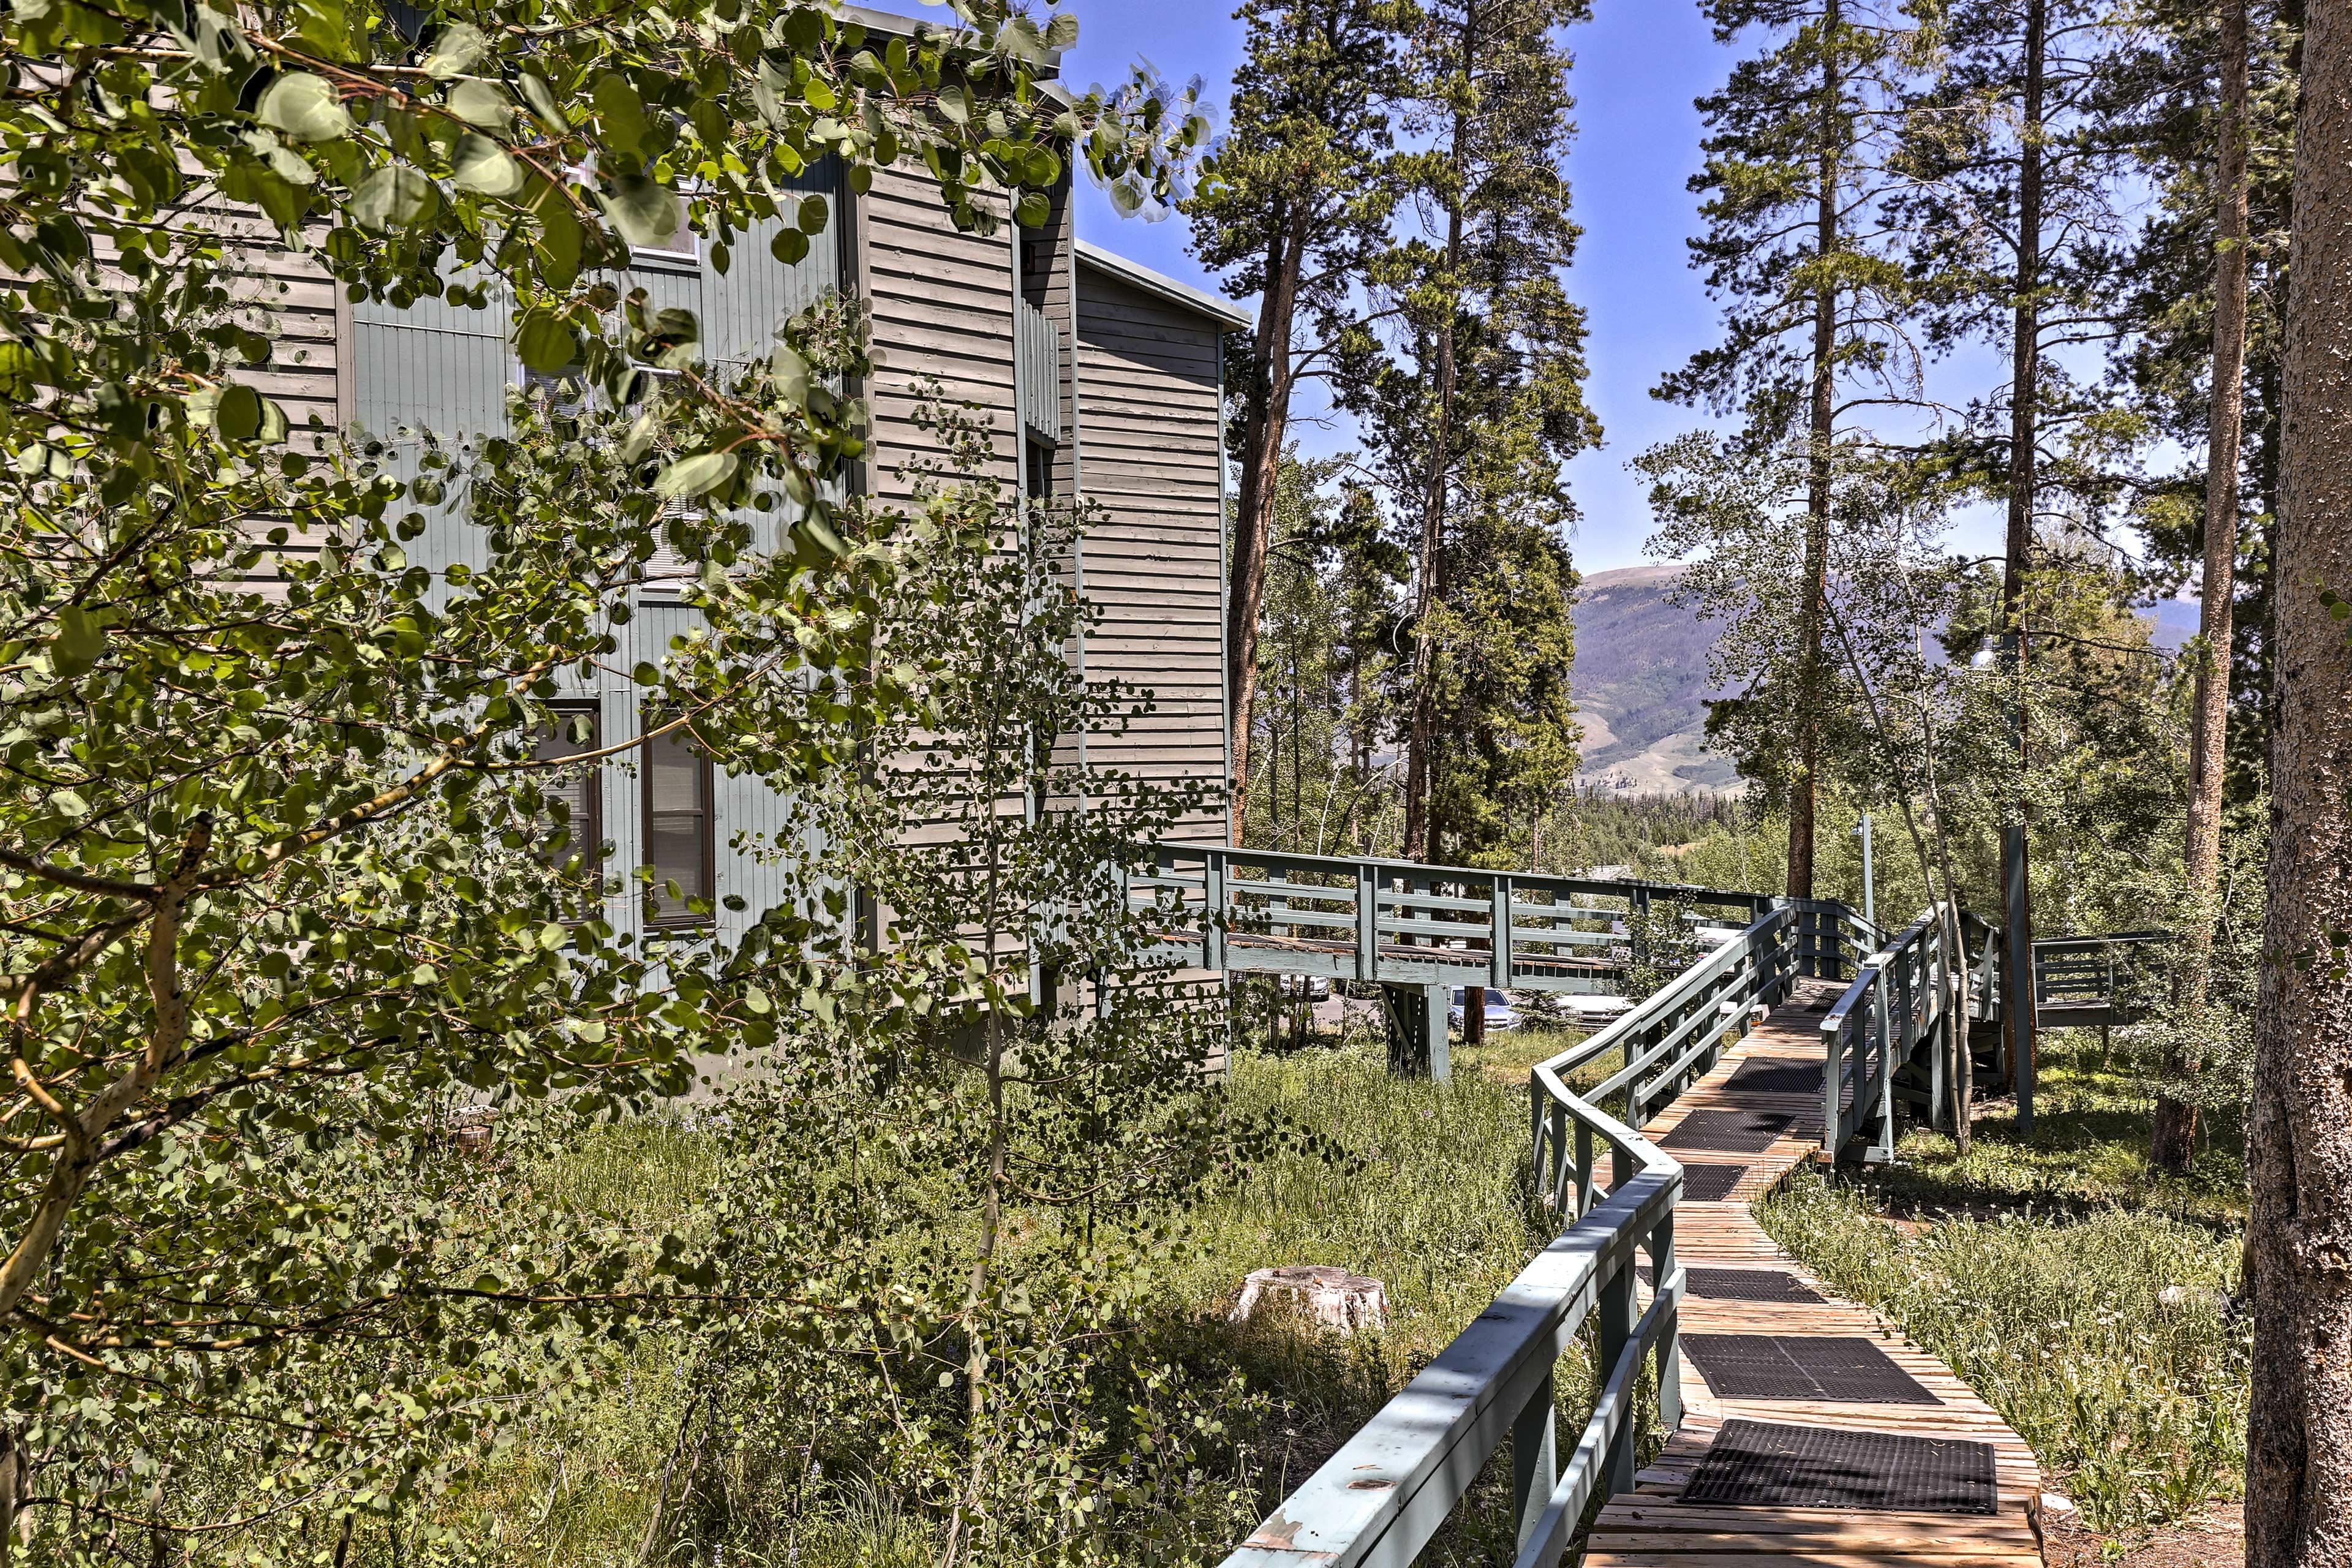 Take a walk around the foliage-filled complex.